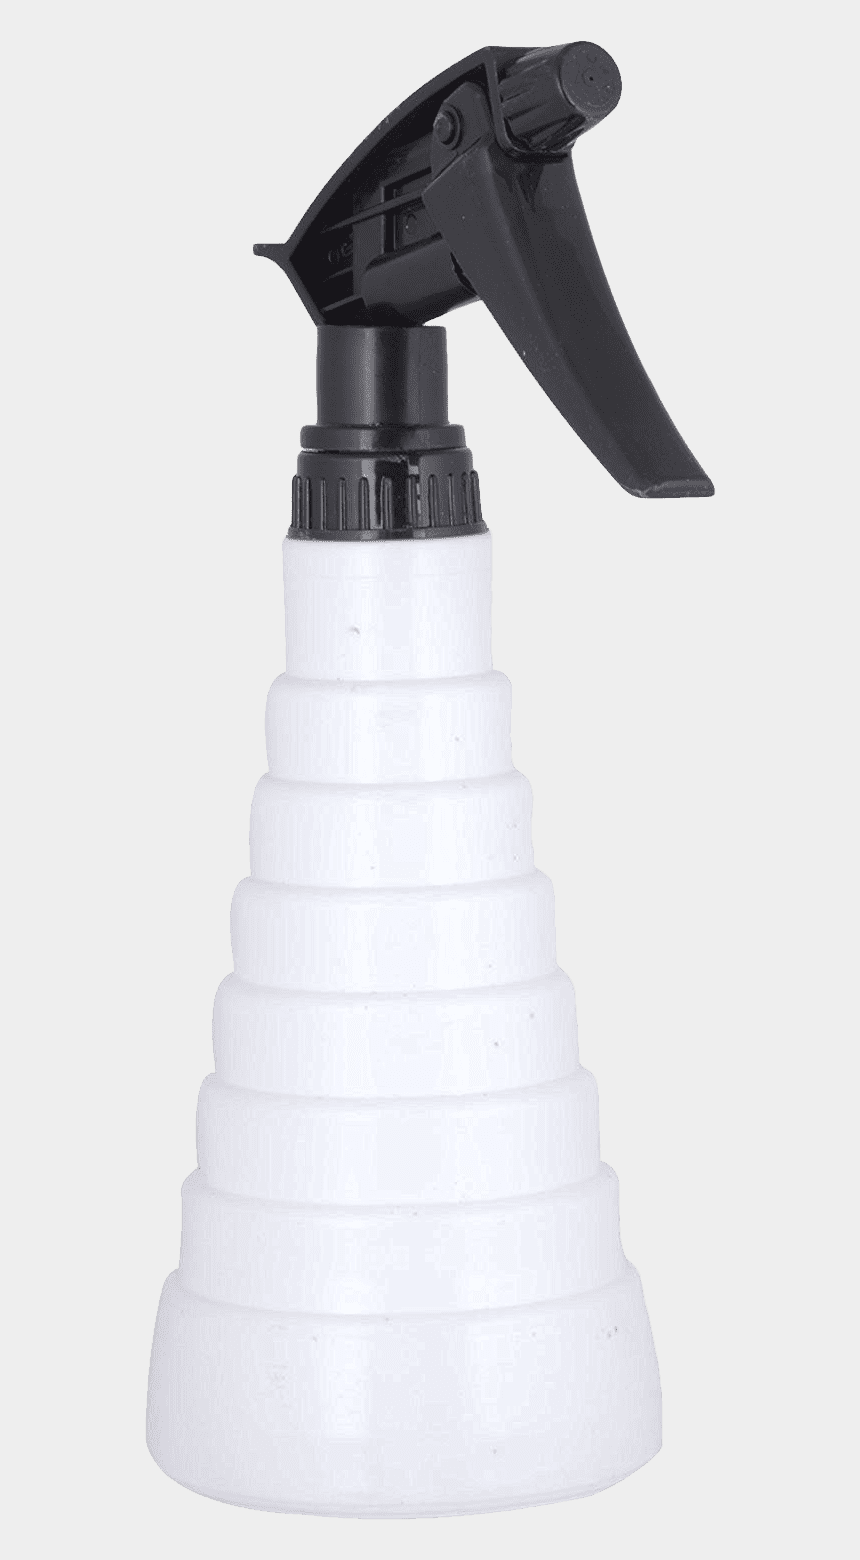 spray bottle clipart free, Cartoons - Spray Bottle - Transparent Spray Bottle Png